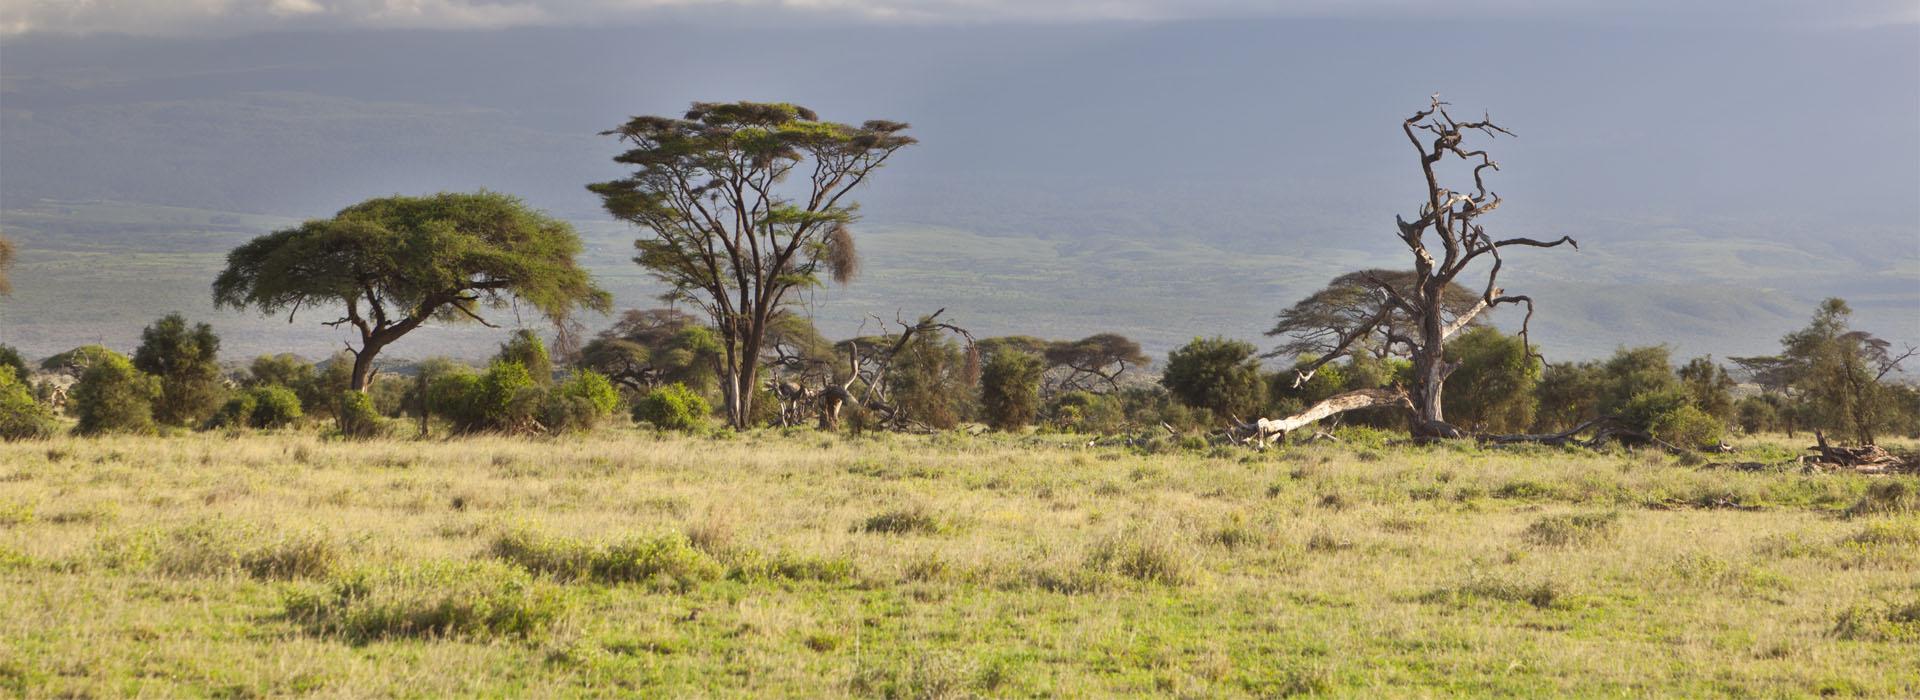 Mt. Kilimanjaro Trekking- The Roof Of Africa - African Adventure Specialists